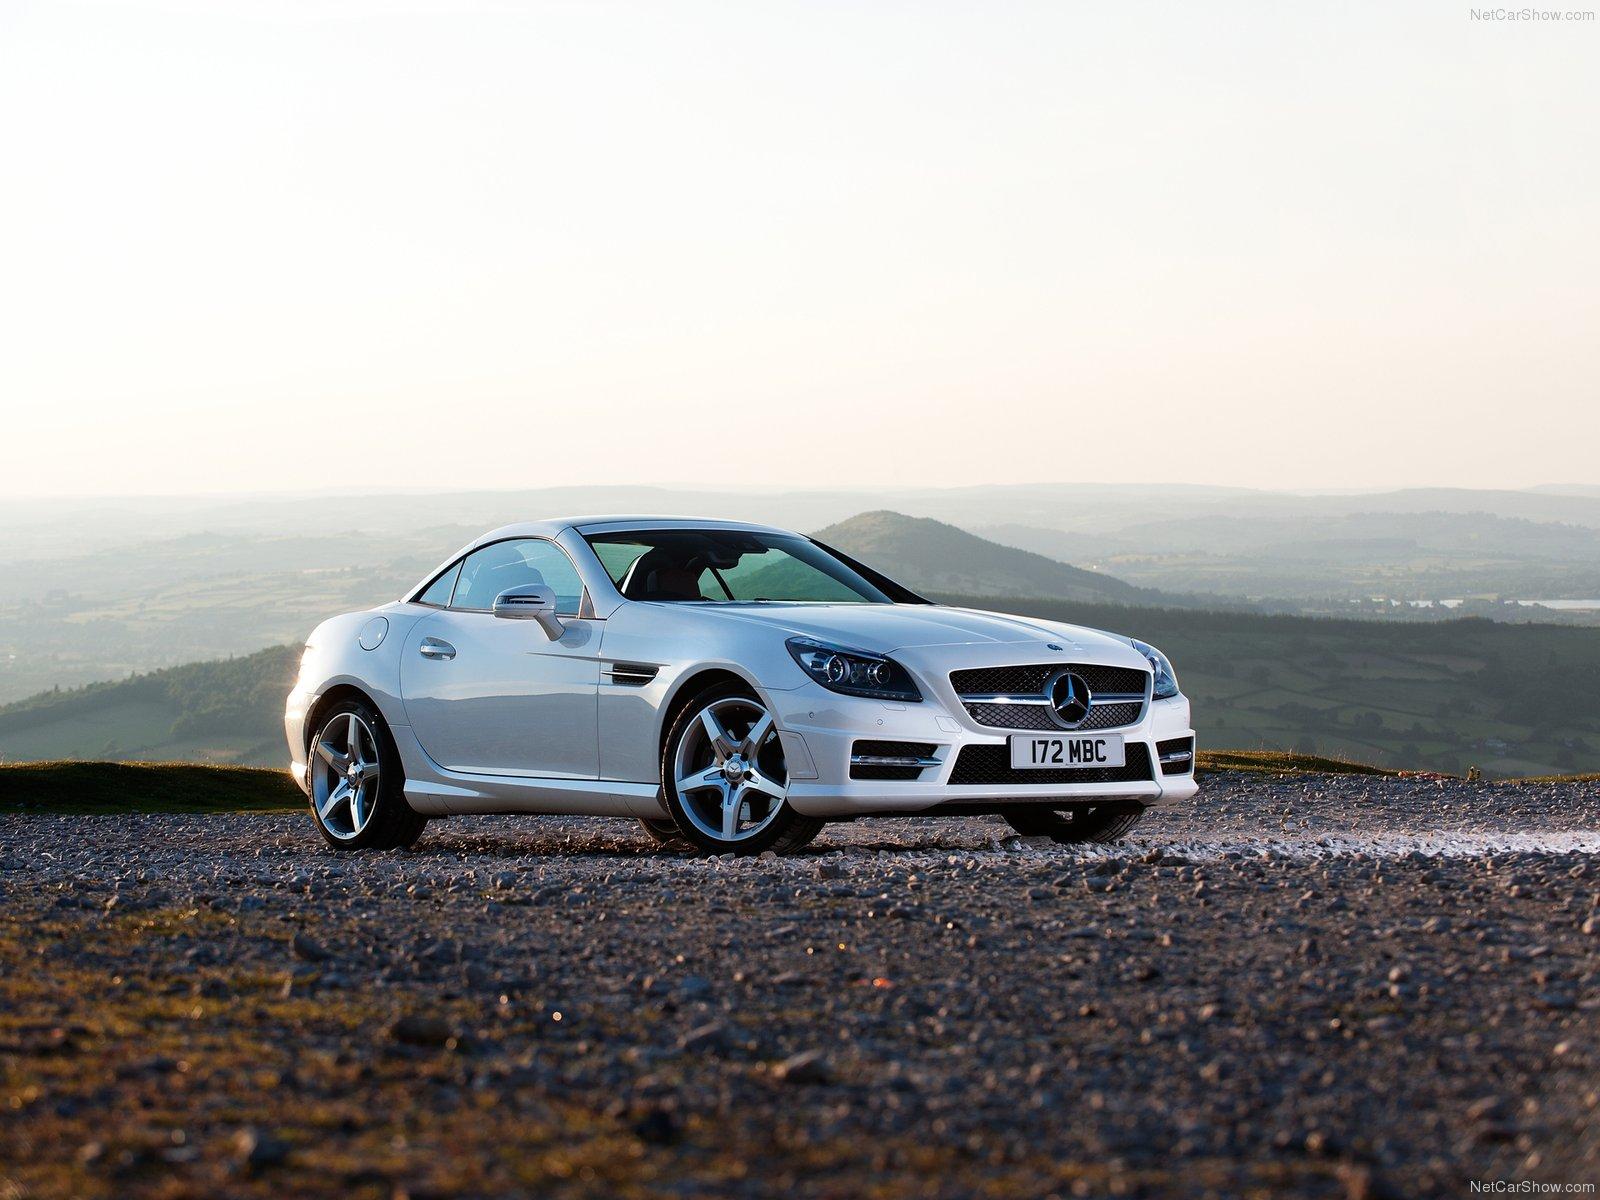 Wallpapers hd for mac mercedes benz slk250 uk version for Mercedes benz slk250